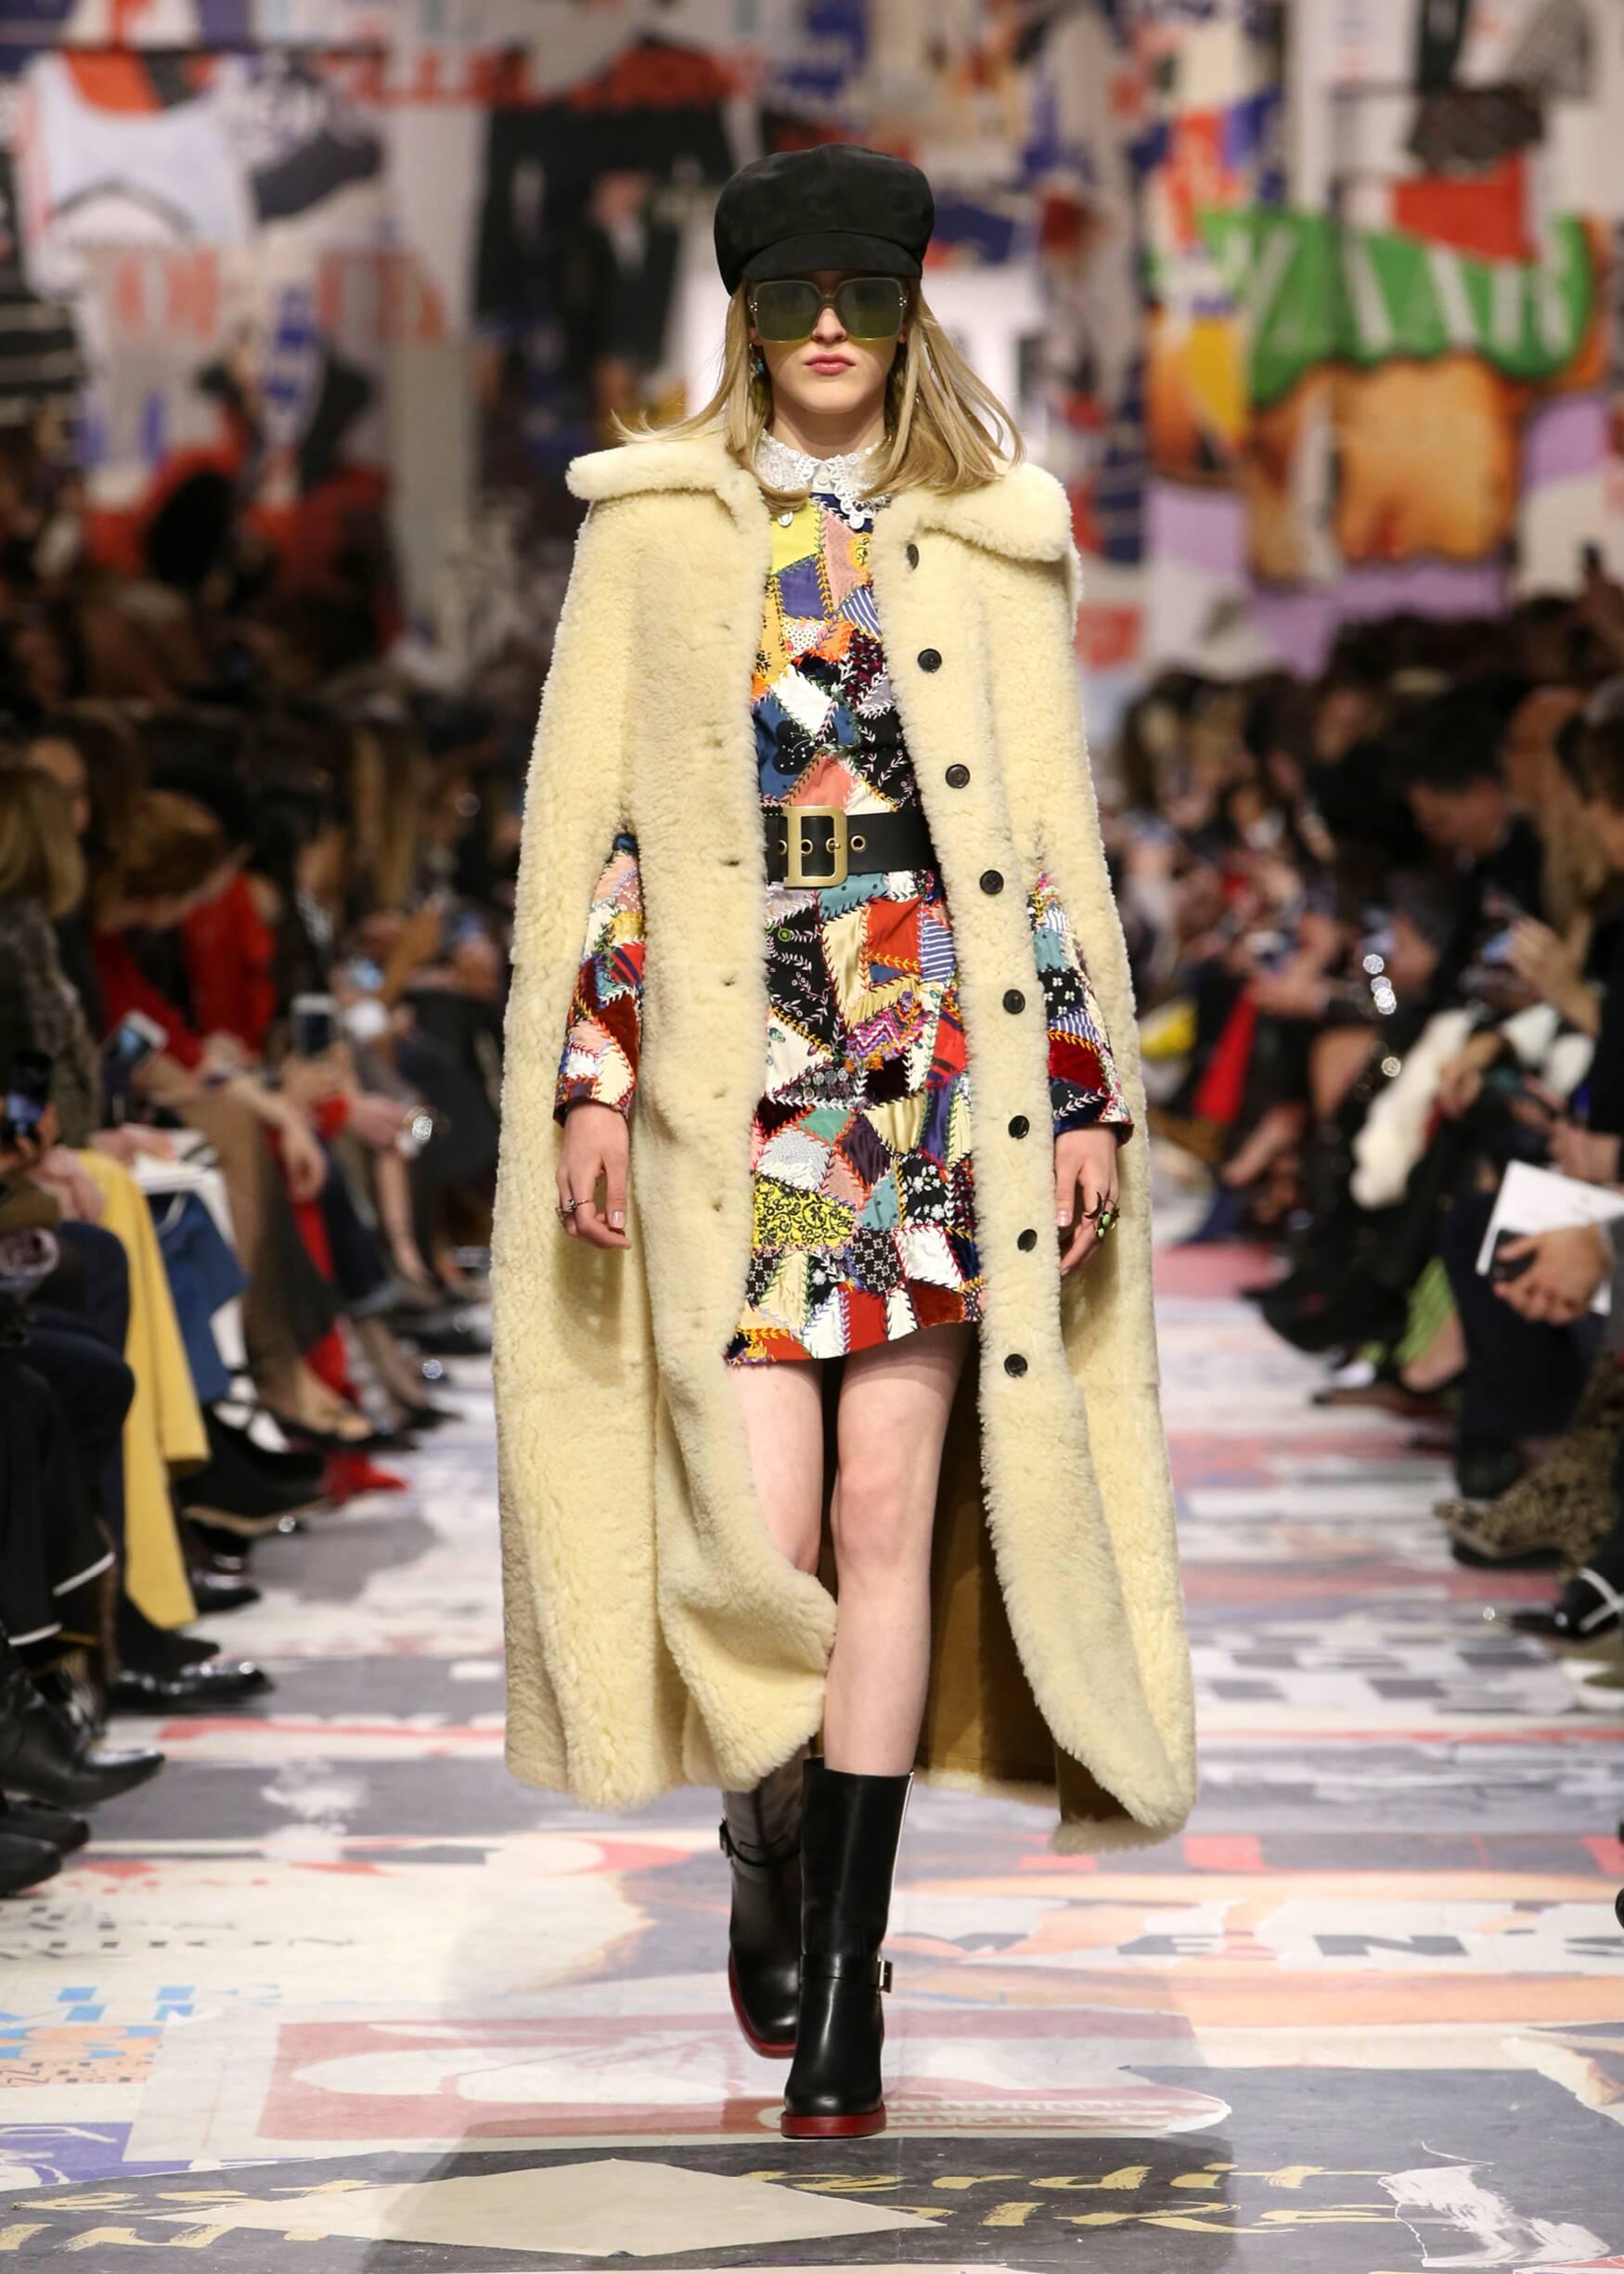 Catwalk Dior Woman Fashion Show Winter 2018